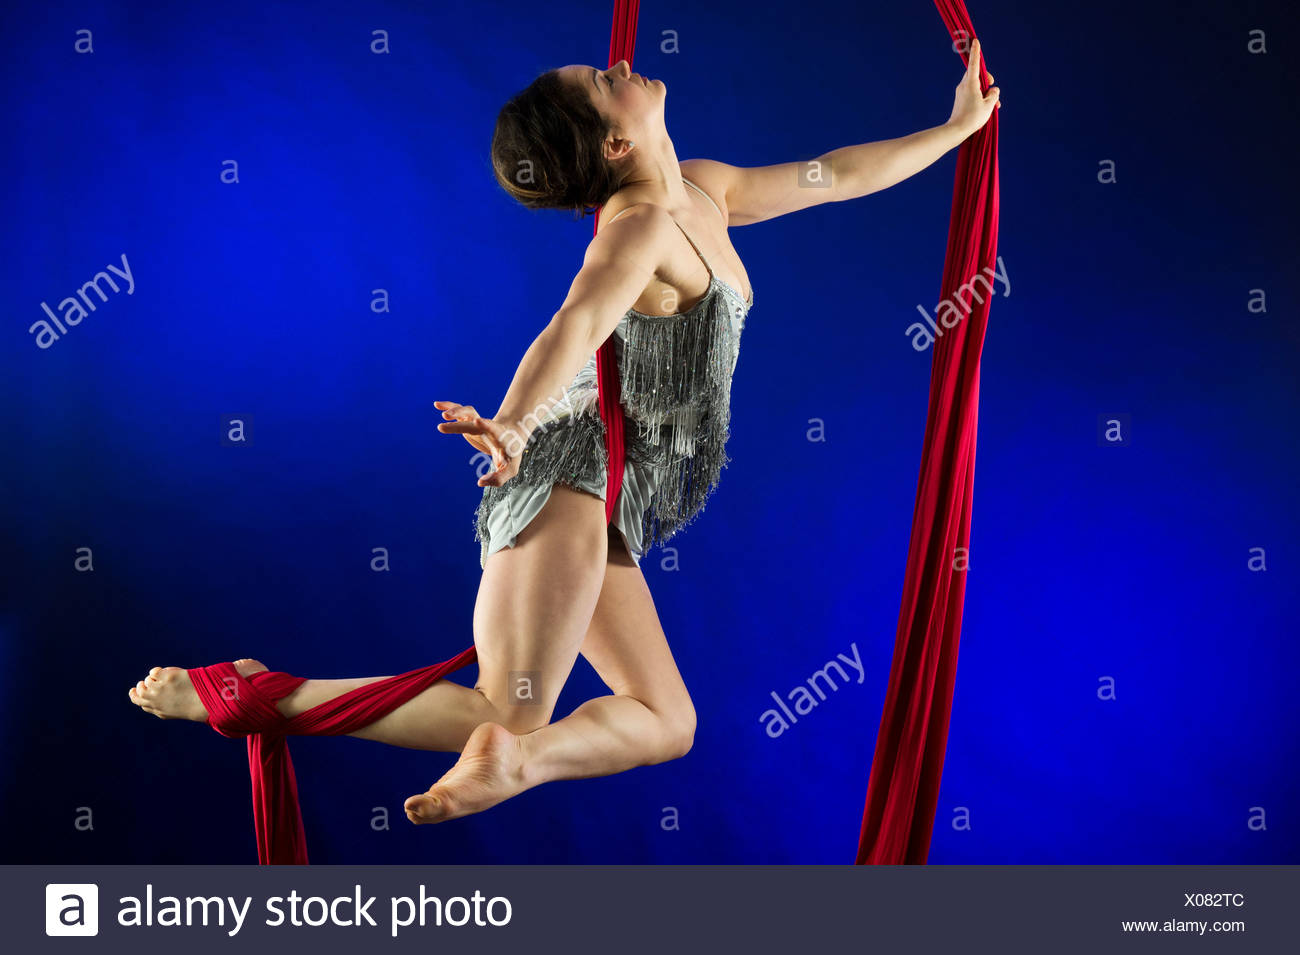 Woman performing acrobatics - Stock Image